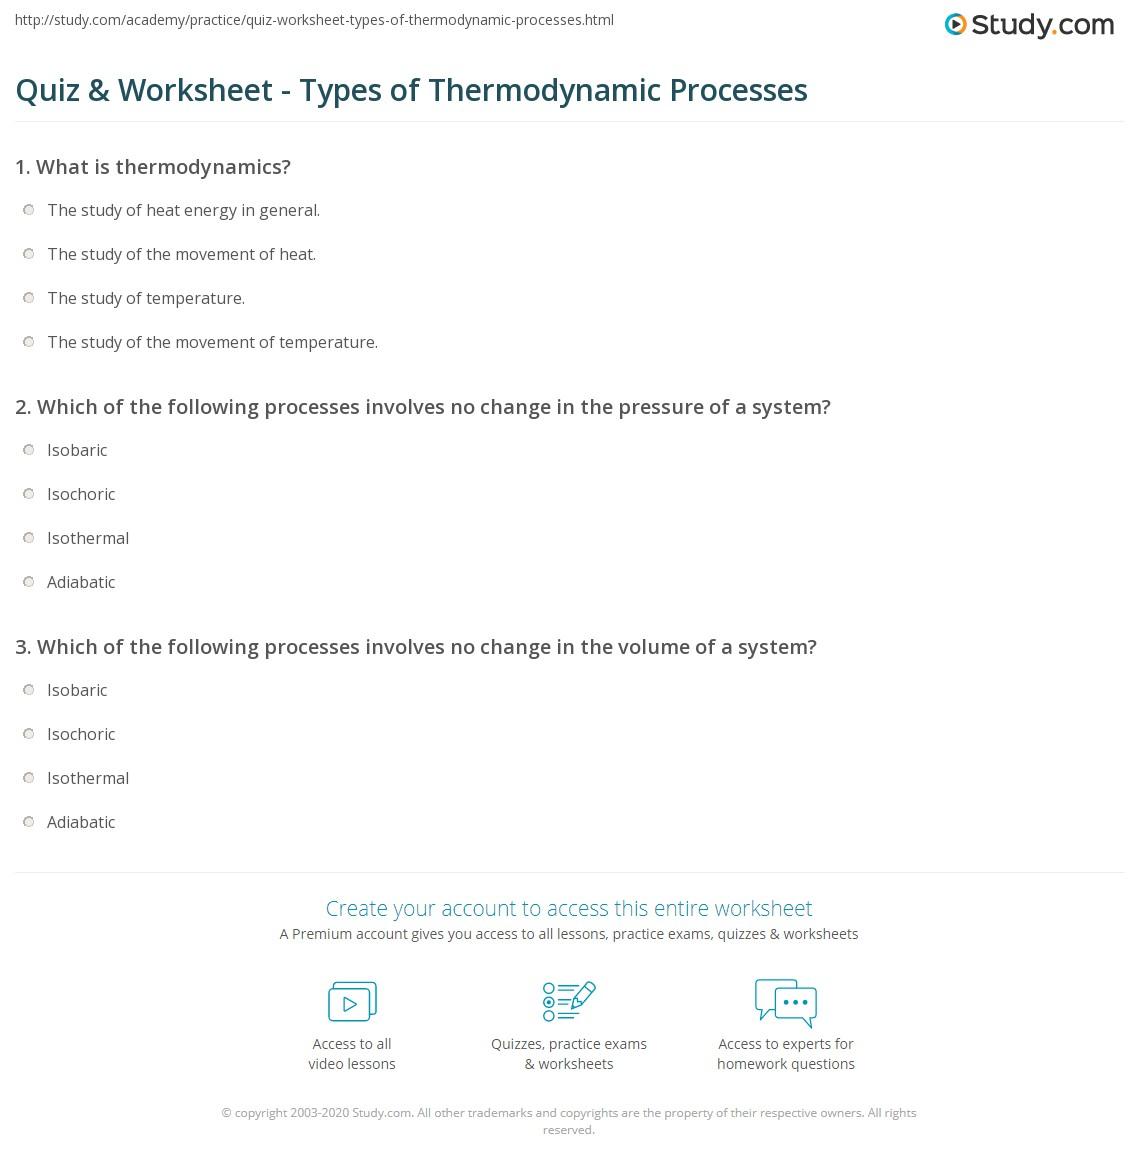 Worksheets Thermodynamics Worksheet Answer Key quiz worksheet types of thermodynamic processes study com print isobaric isochoric isothermal adiabatic worksheet